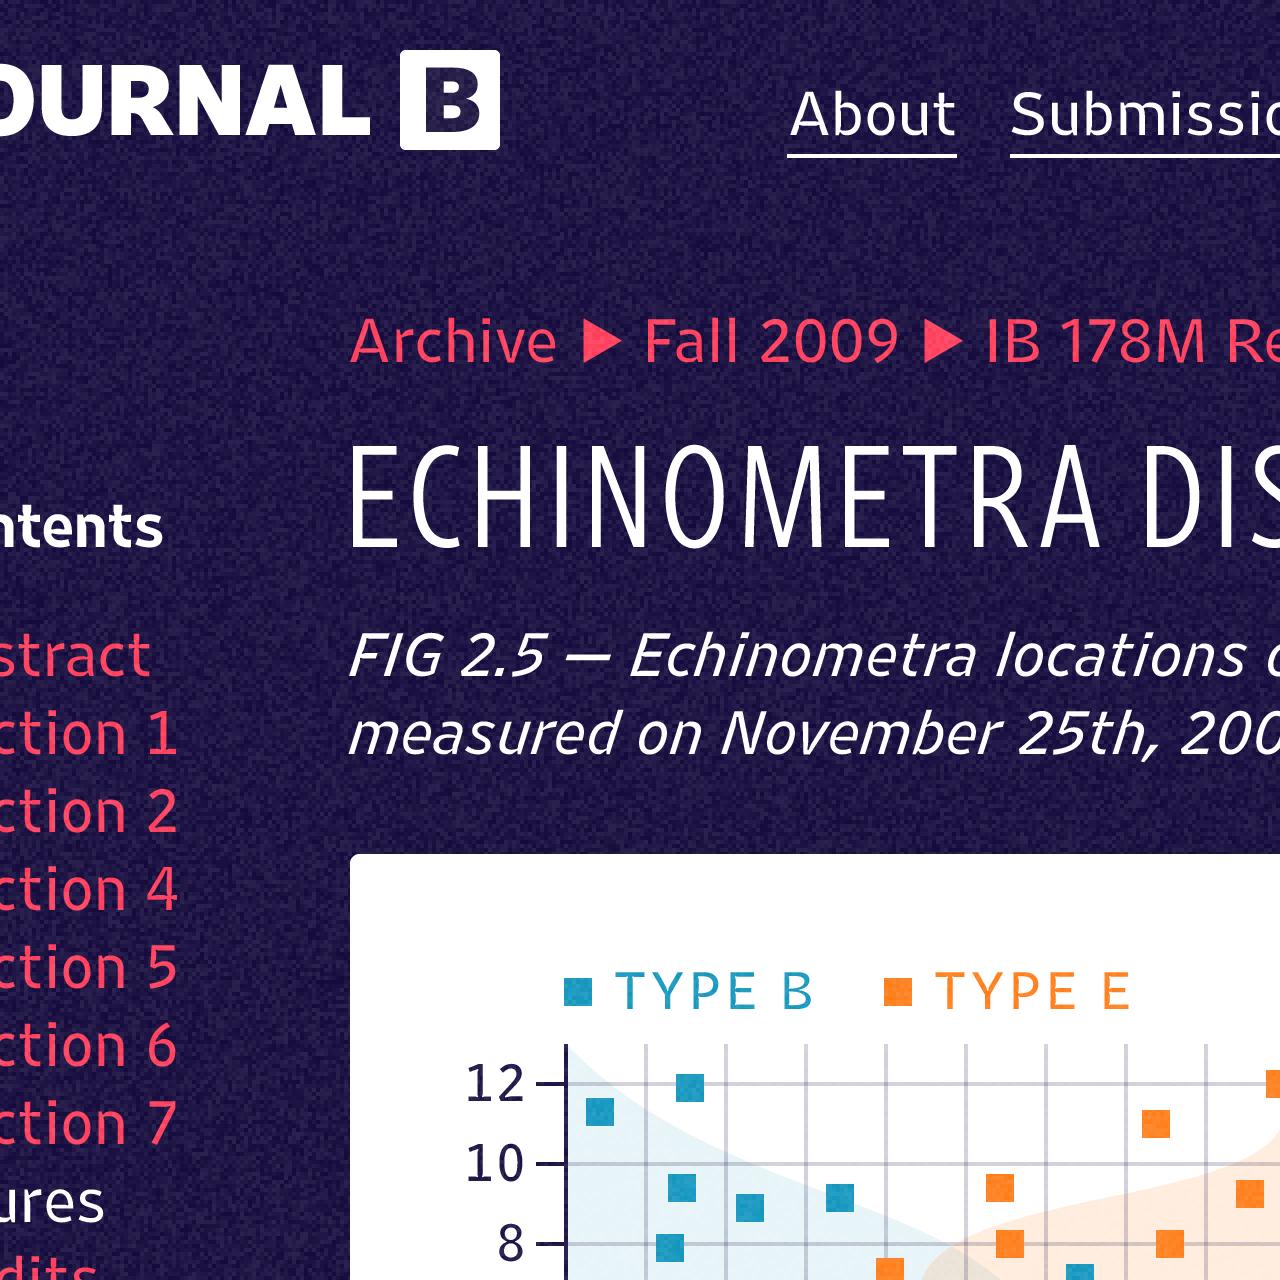 retina-echinometra-1280x1280.png